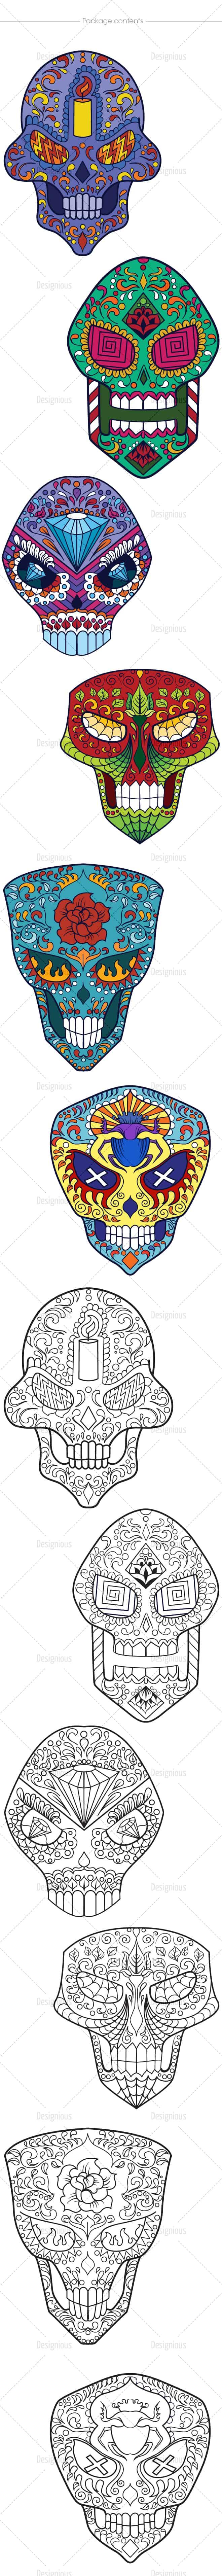 Sugar Skulls Vector Pack 46 designious vector sugar skulls 46 large